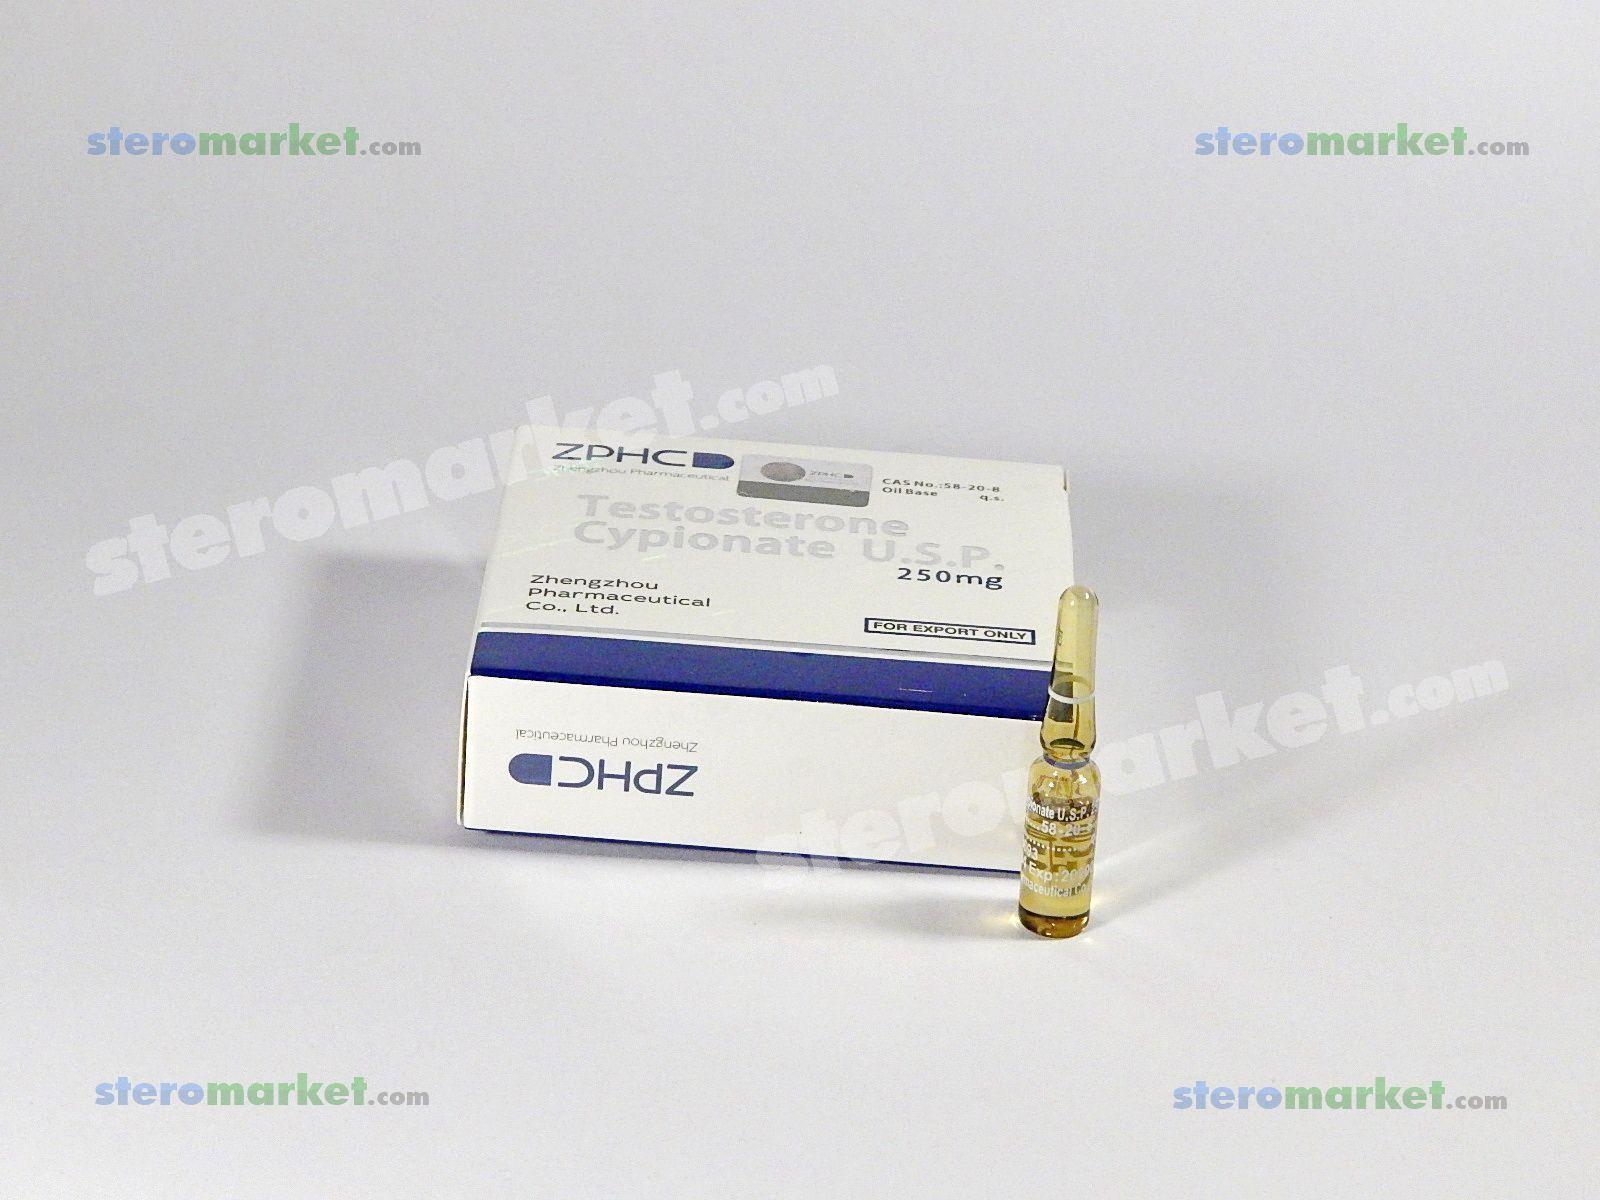 Zhengzhou Testosterone Cypionate 250mg 1ml amp Buy Online